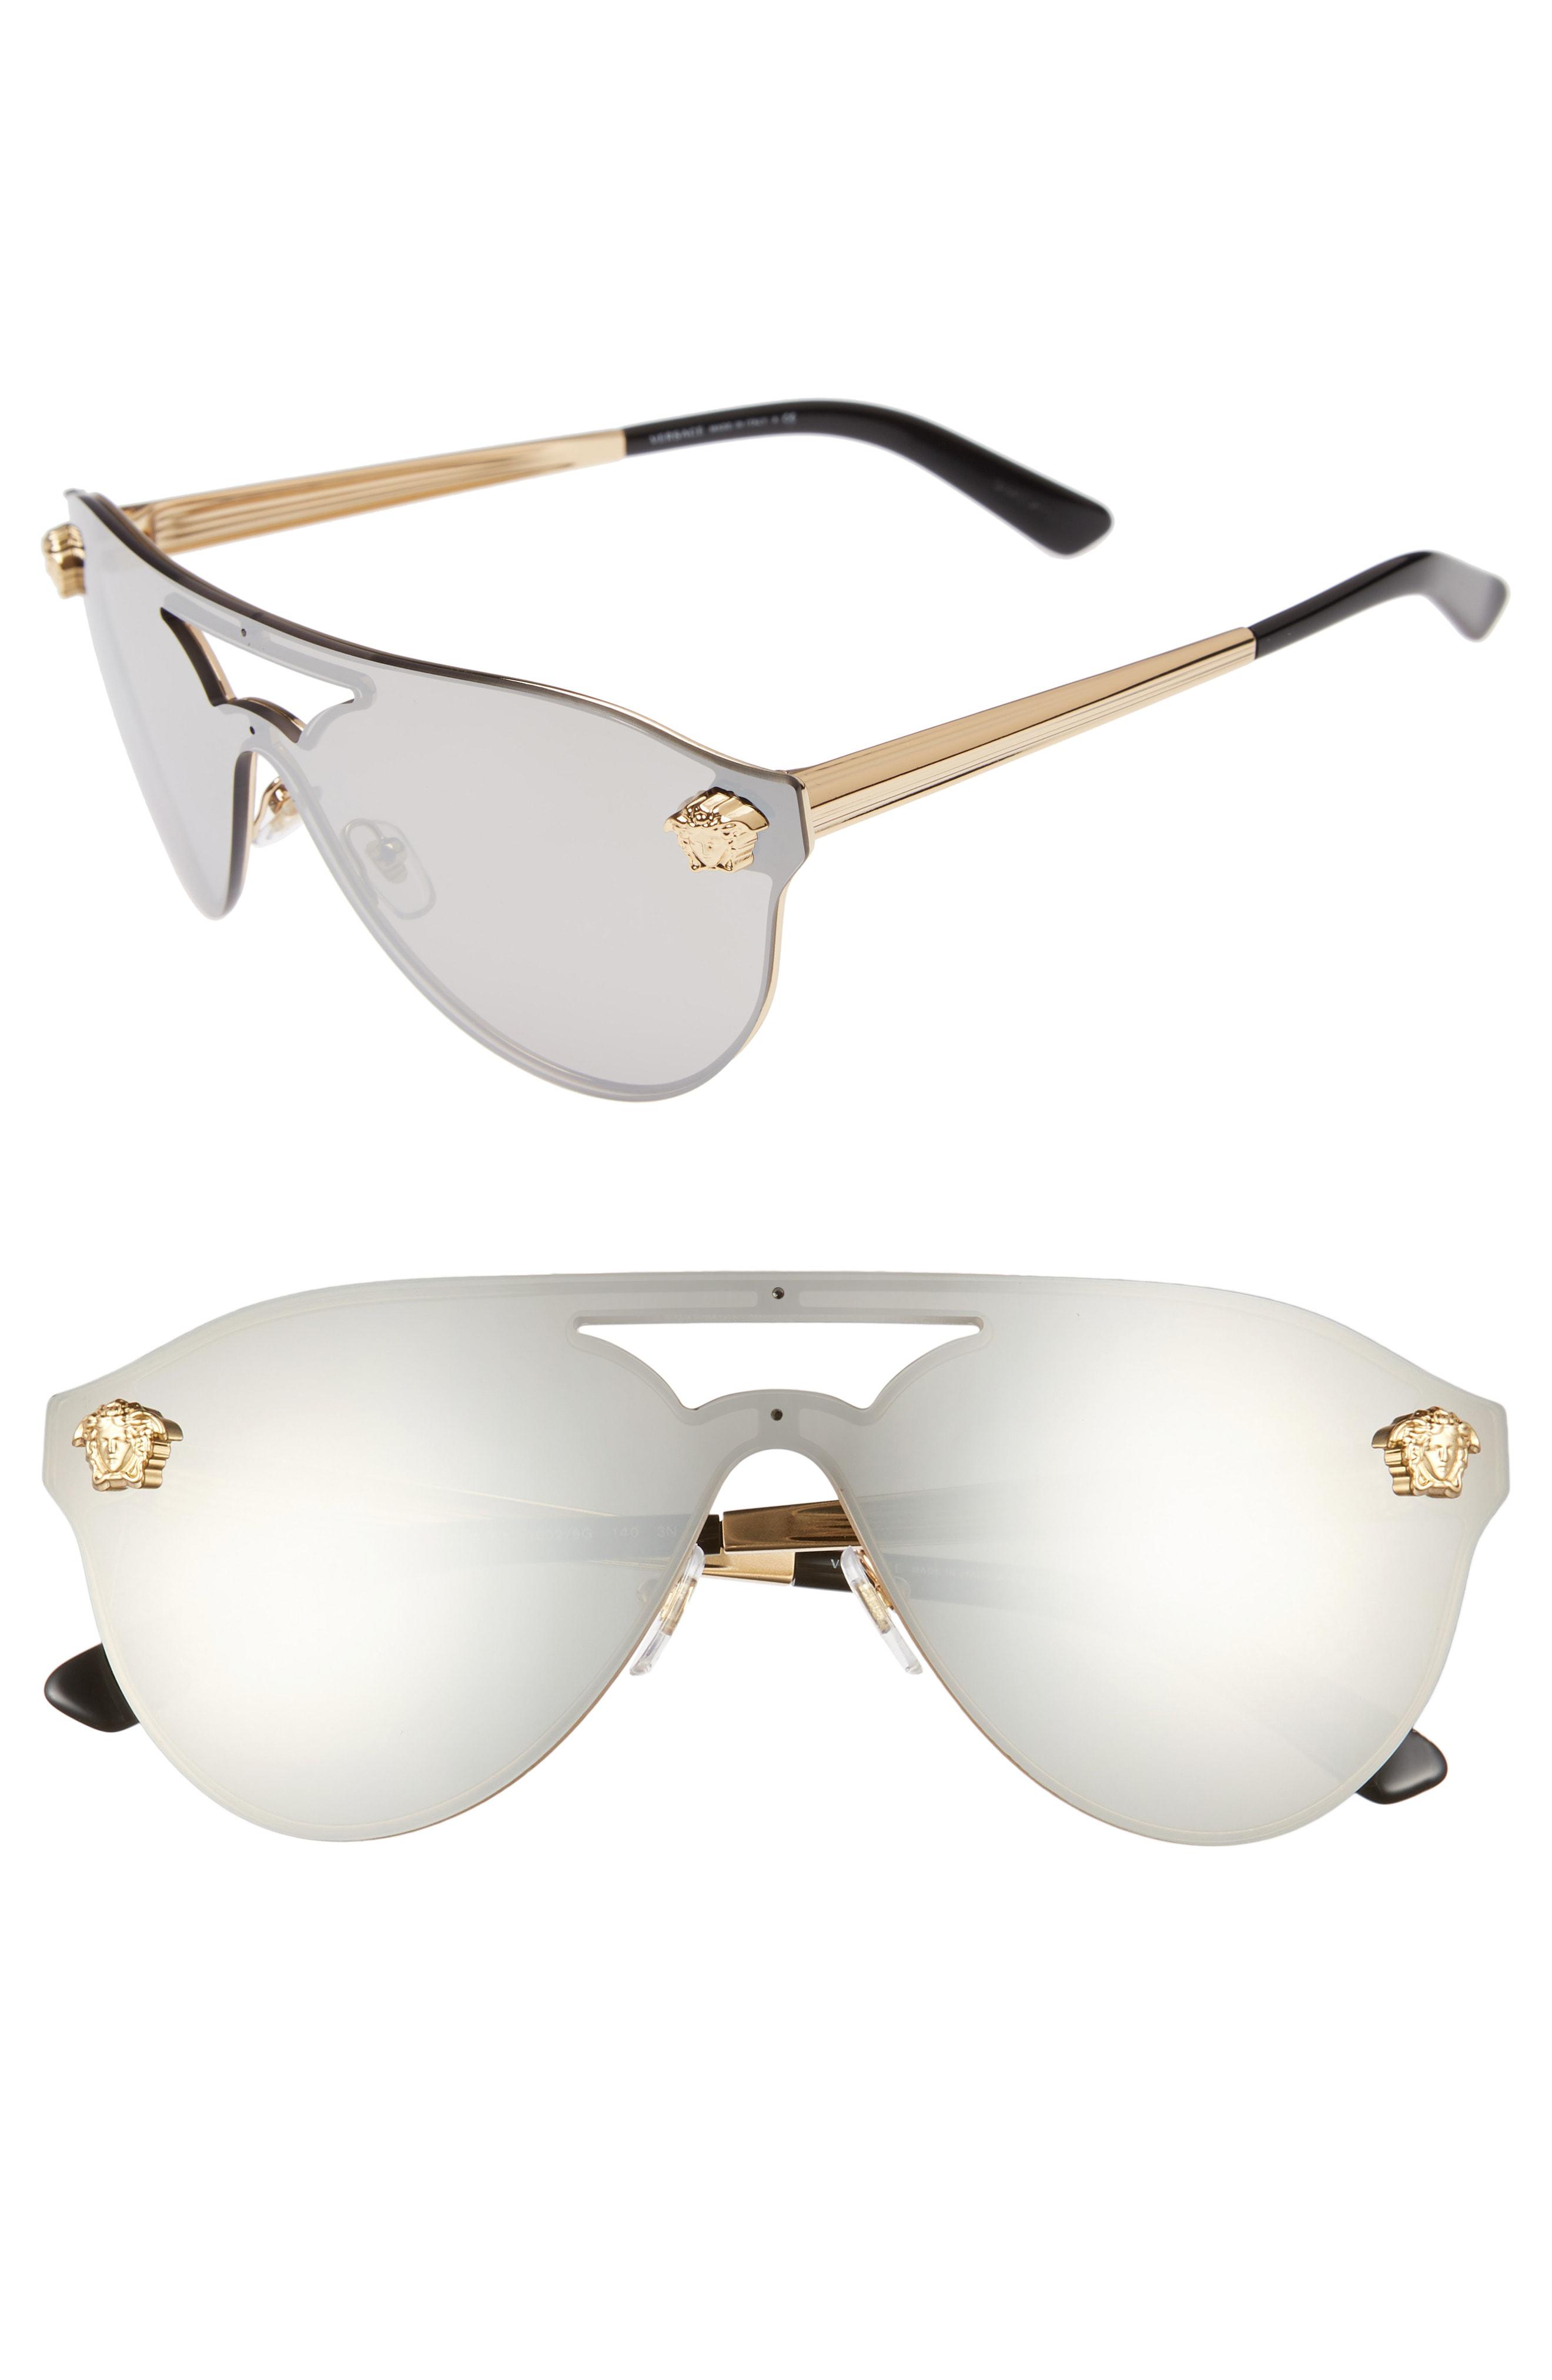 a03562d40 Versace 60Mm Shield Mirrored Sunglasses - Gold/ Silver Mirror In Gold/Silver  Mirror